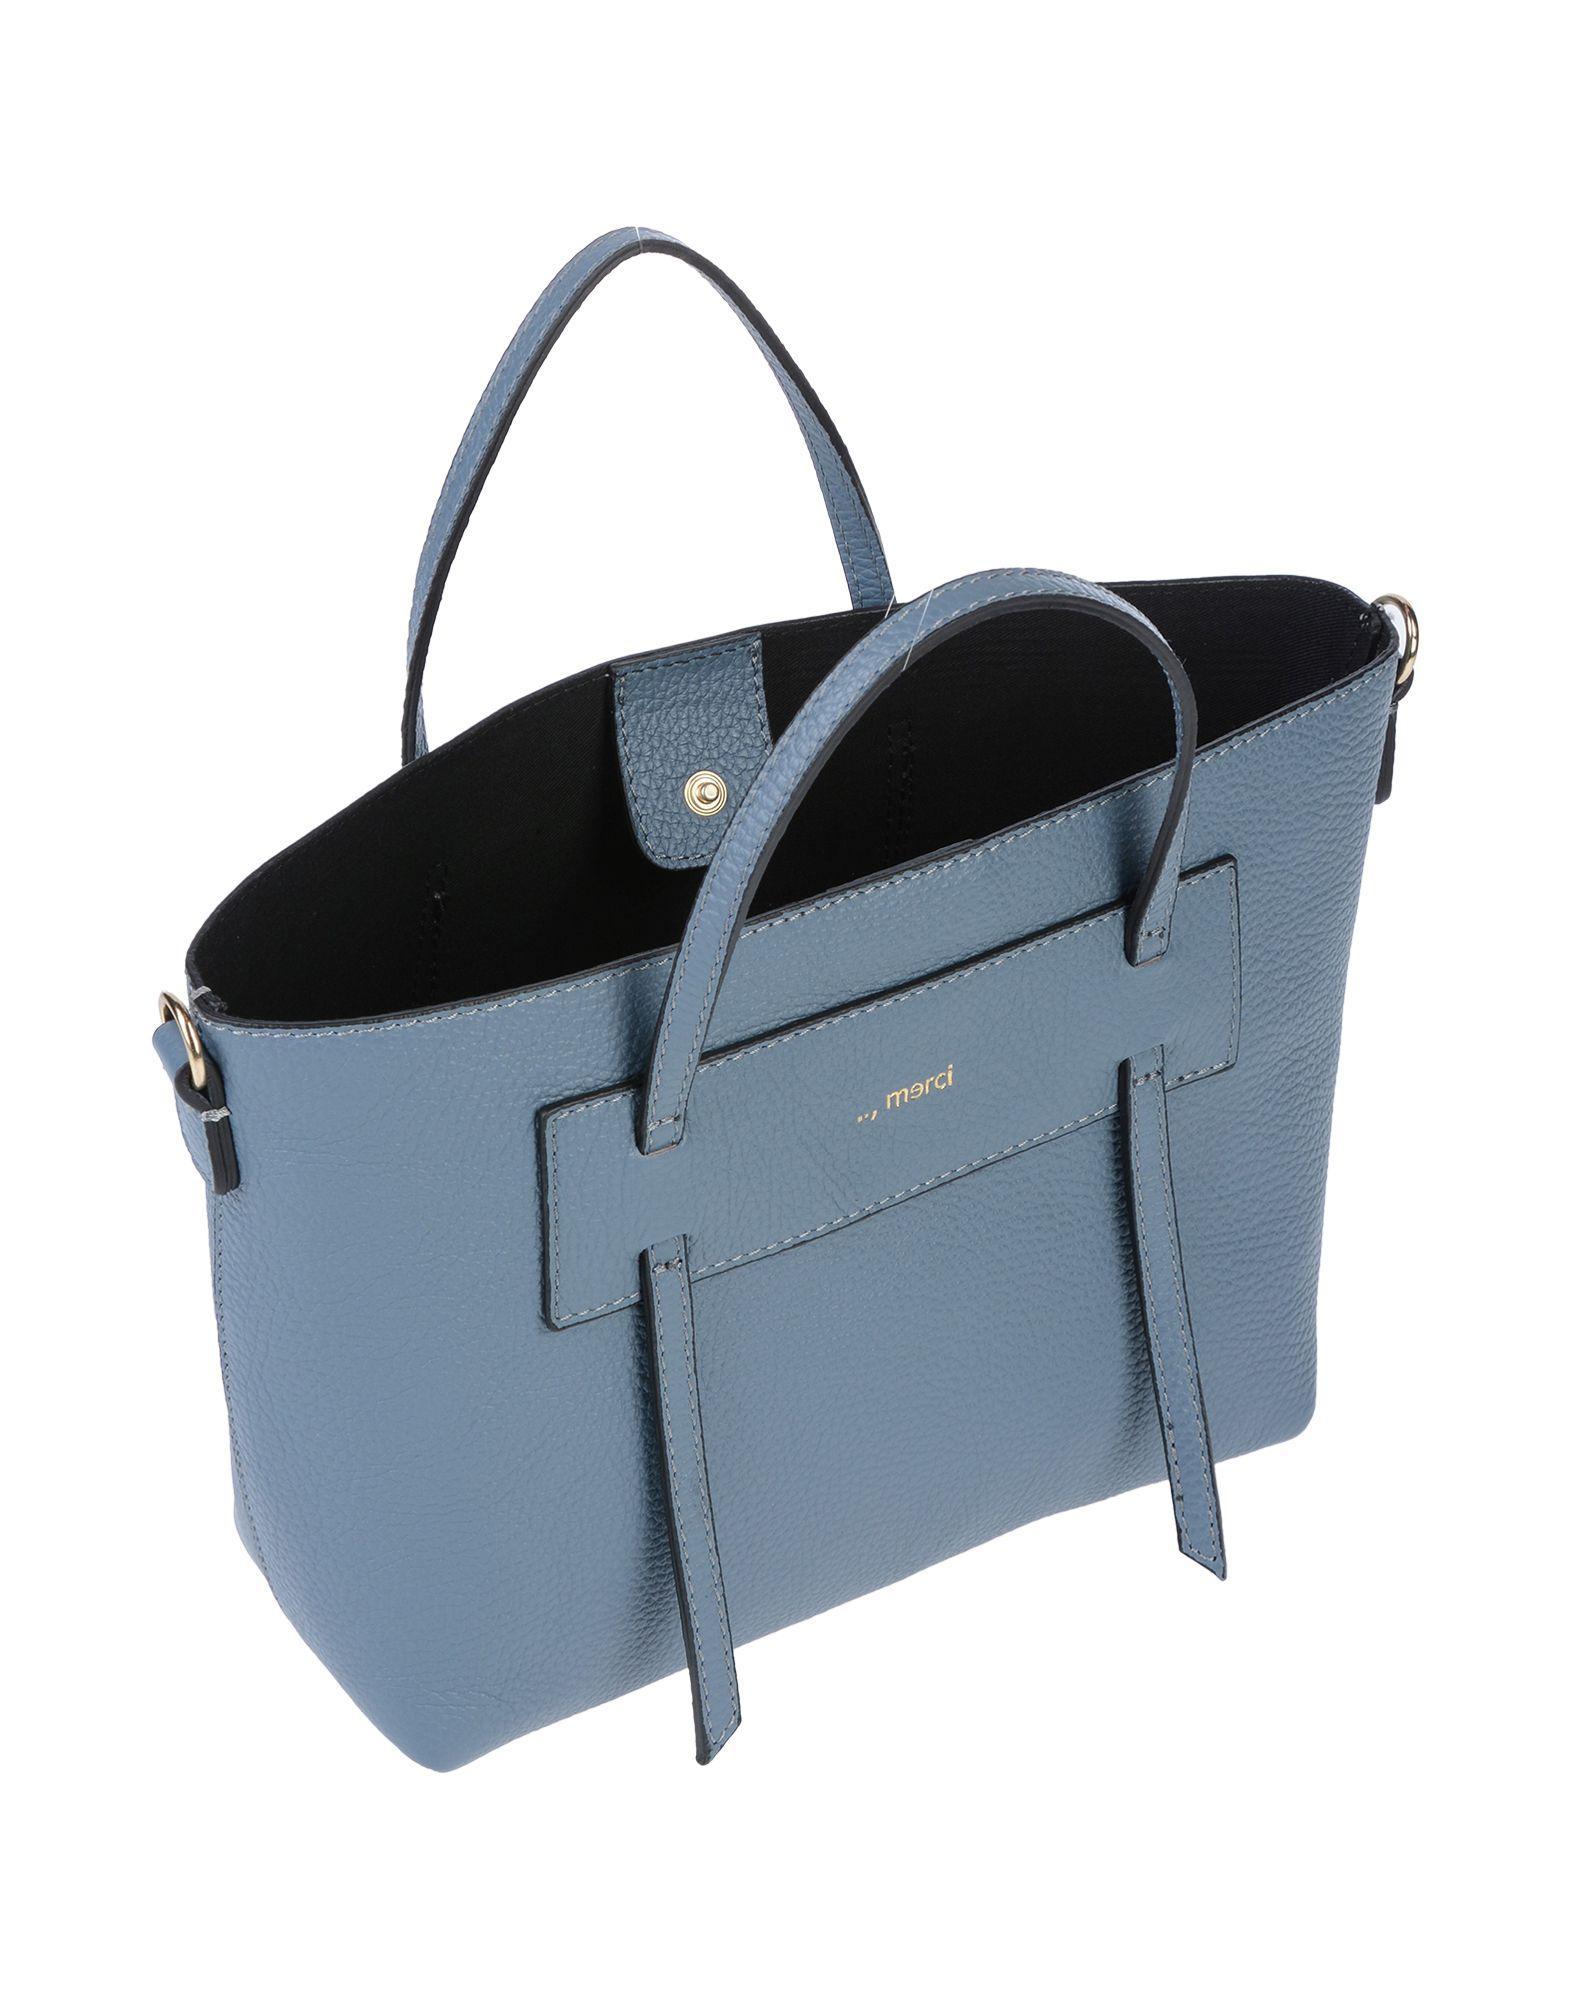 ..,merci Leder Handtaschen in Blau  YT3sK